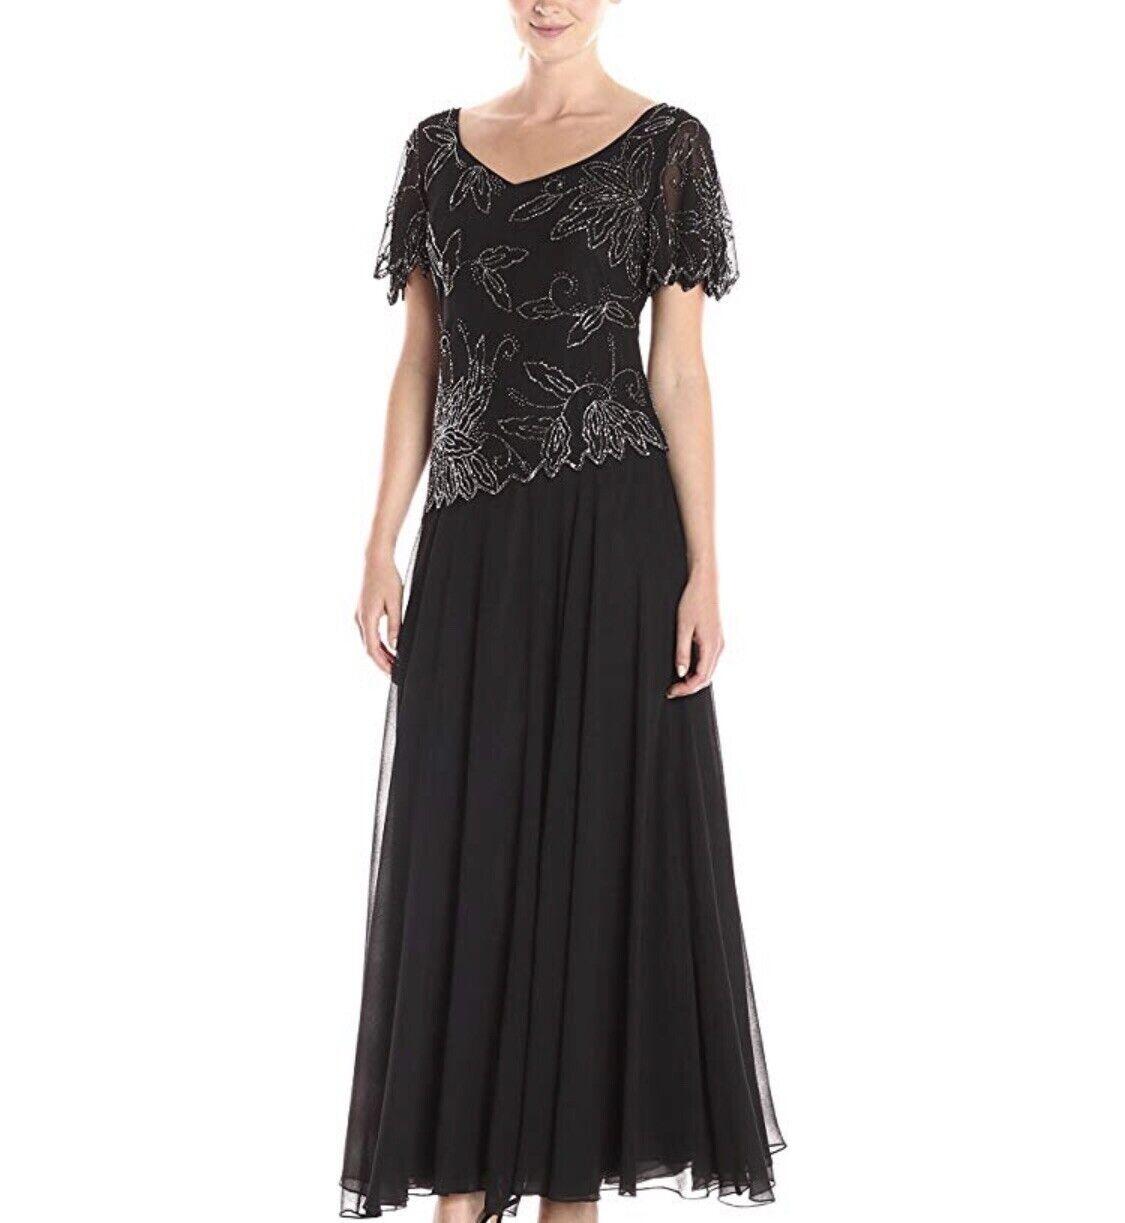 JKARA Women's 10 Long Black Beaded Dress Gown Evening Formal Nordstrom NEW